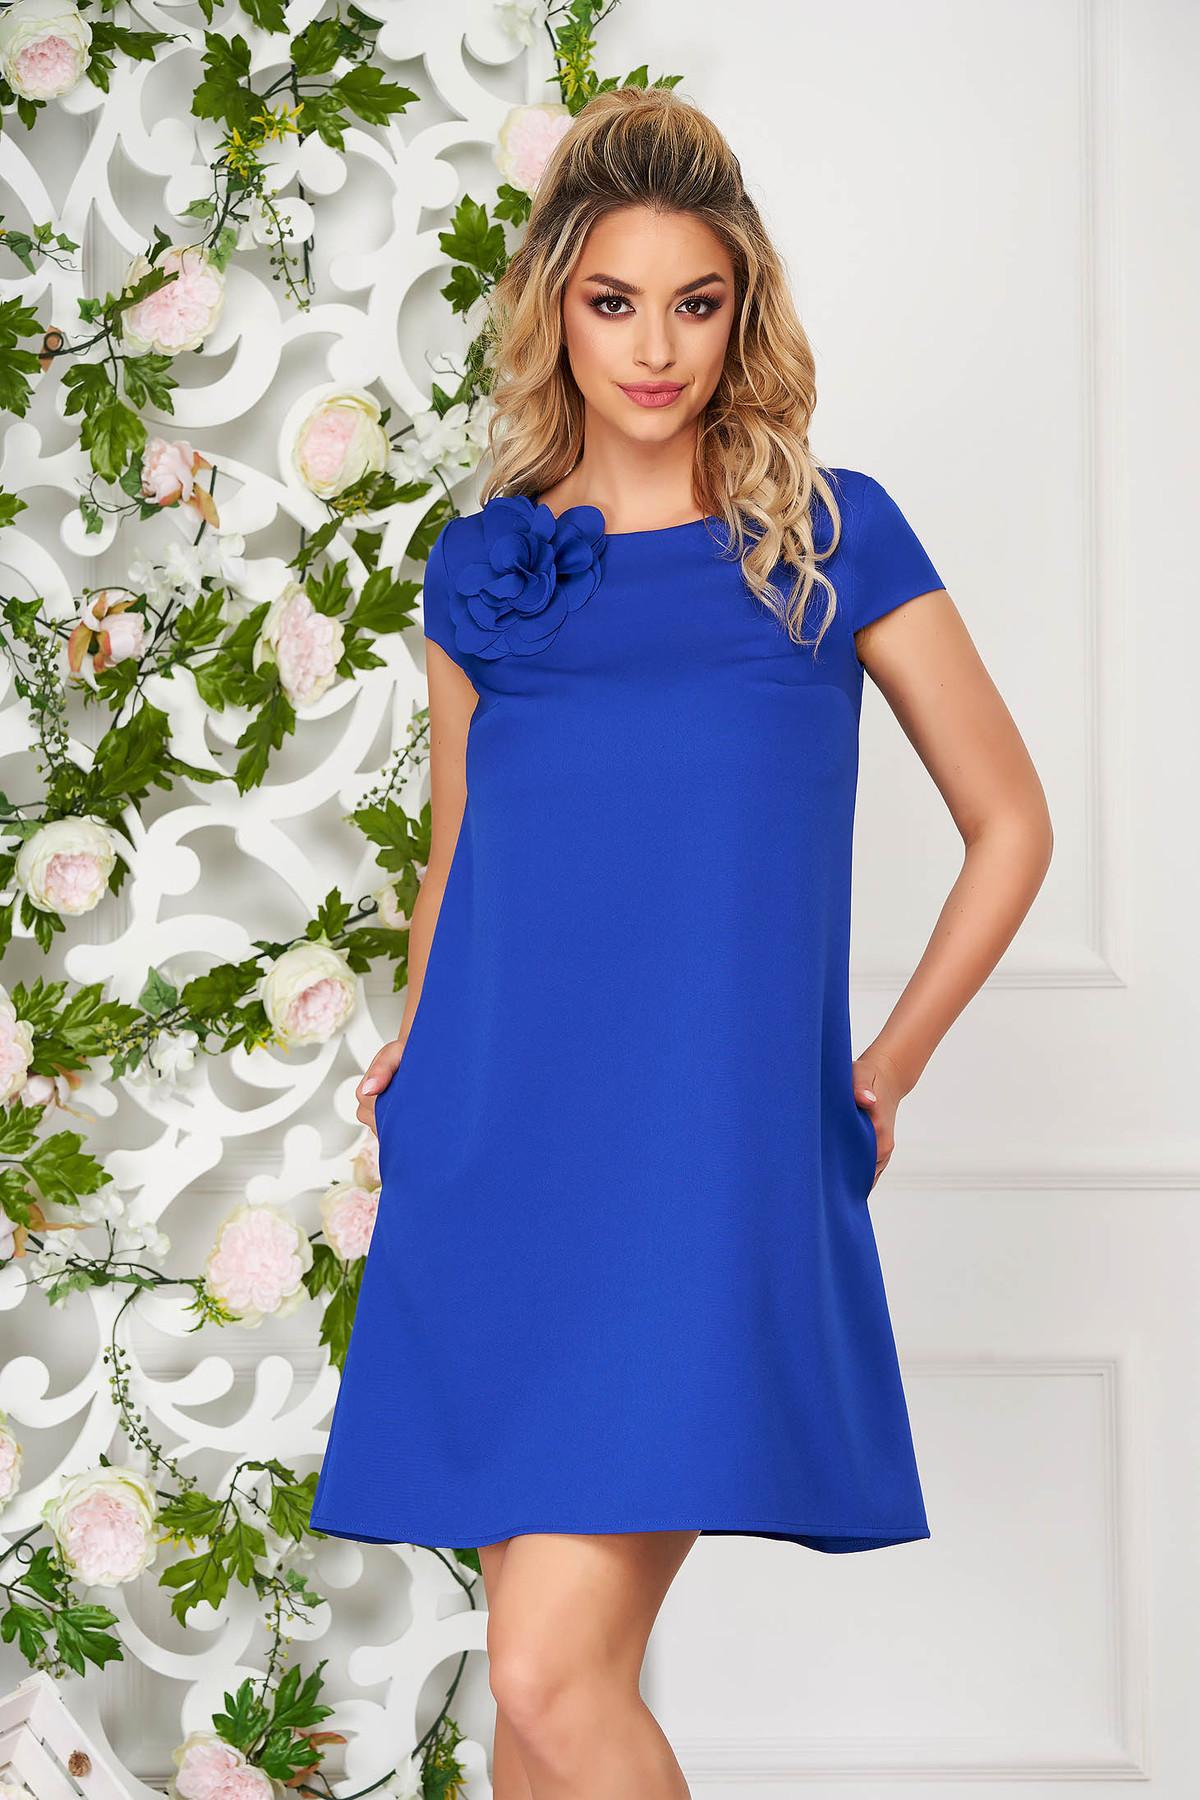 Rochie StarShinerS albastra scurta de zi cu croi larg din stofa elastica cu buzunare imagine